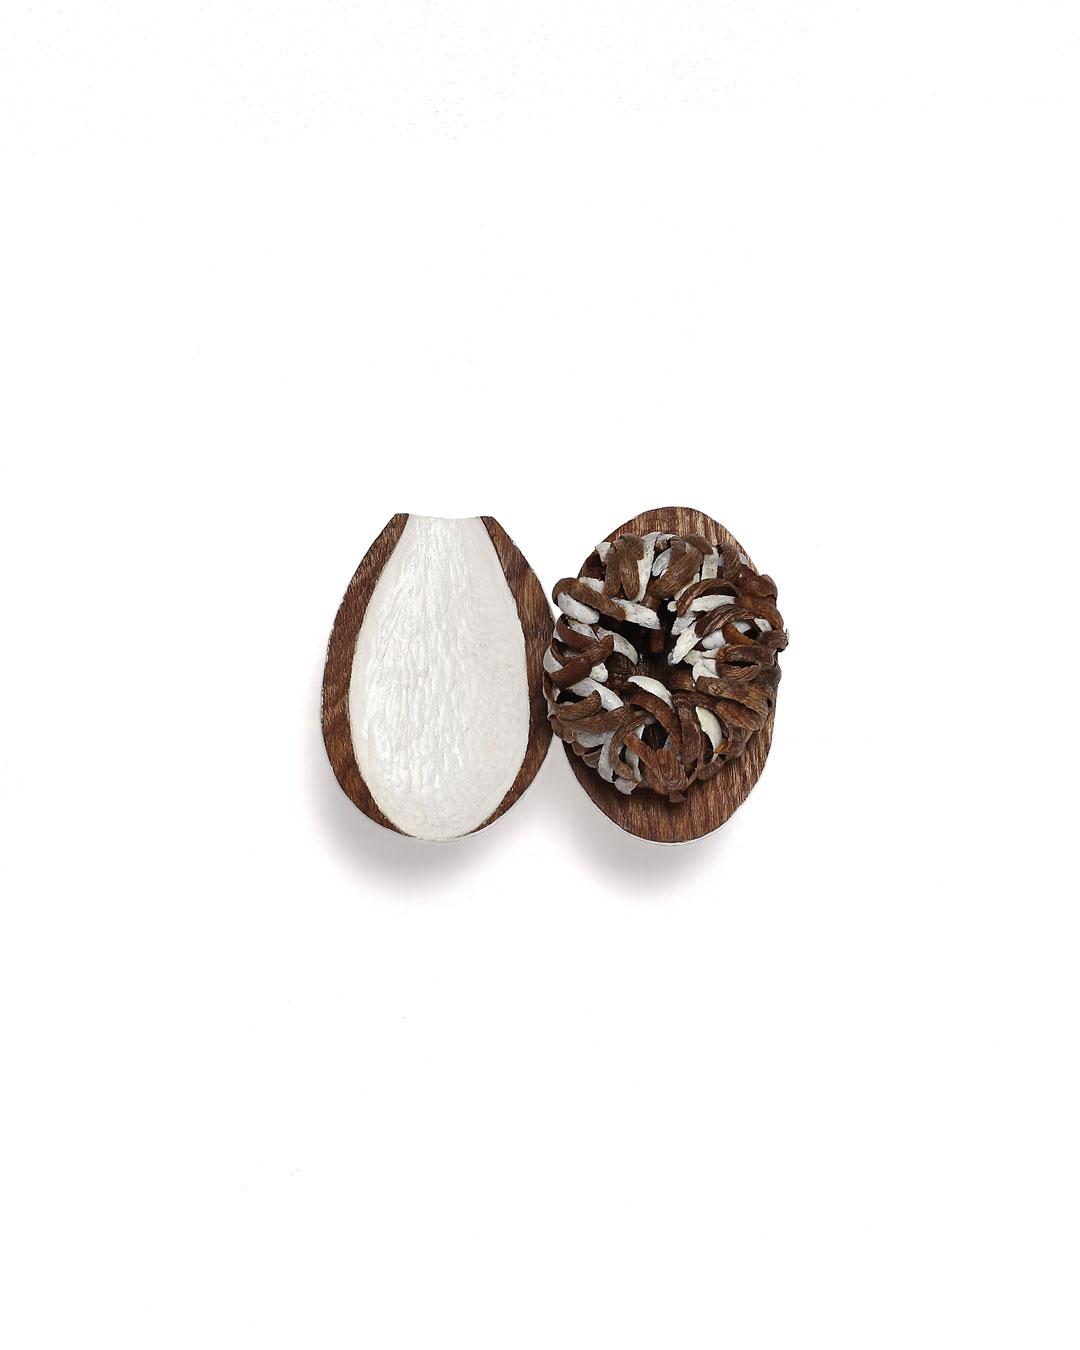 Dongchun Lee, Flourish Wither, 2013, brooch; wood, nylon thread, nickel silver, 105 x 80 x 45 mm, €1940